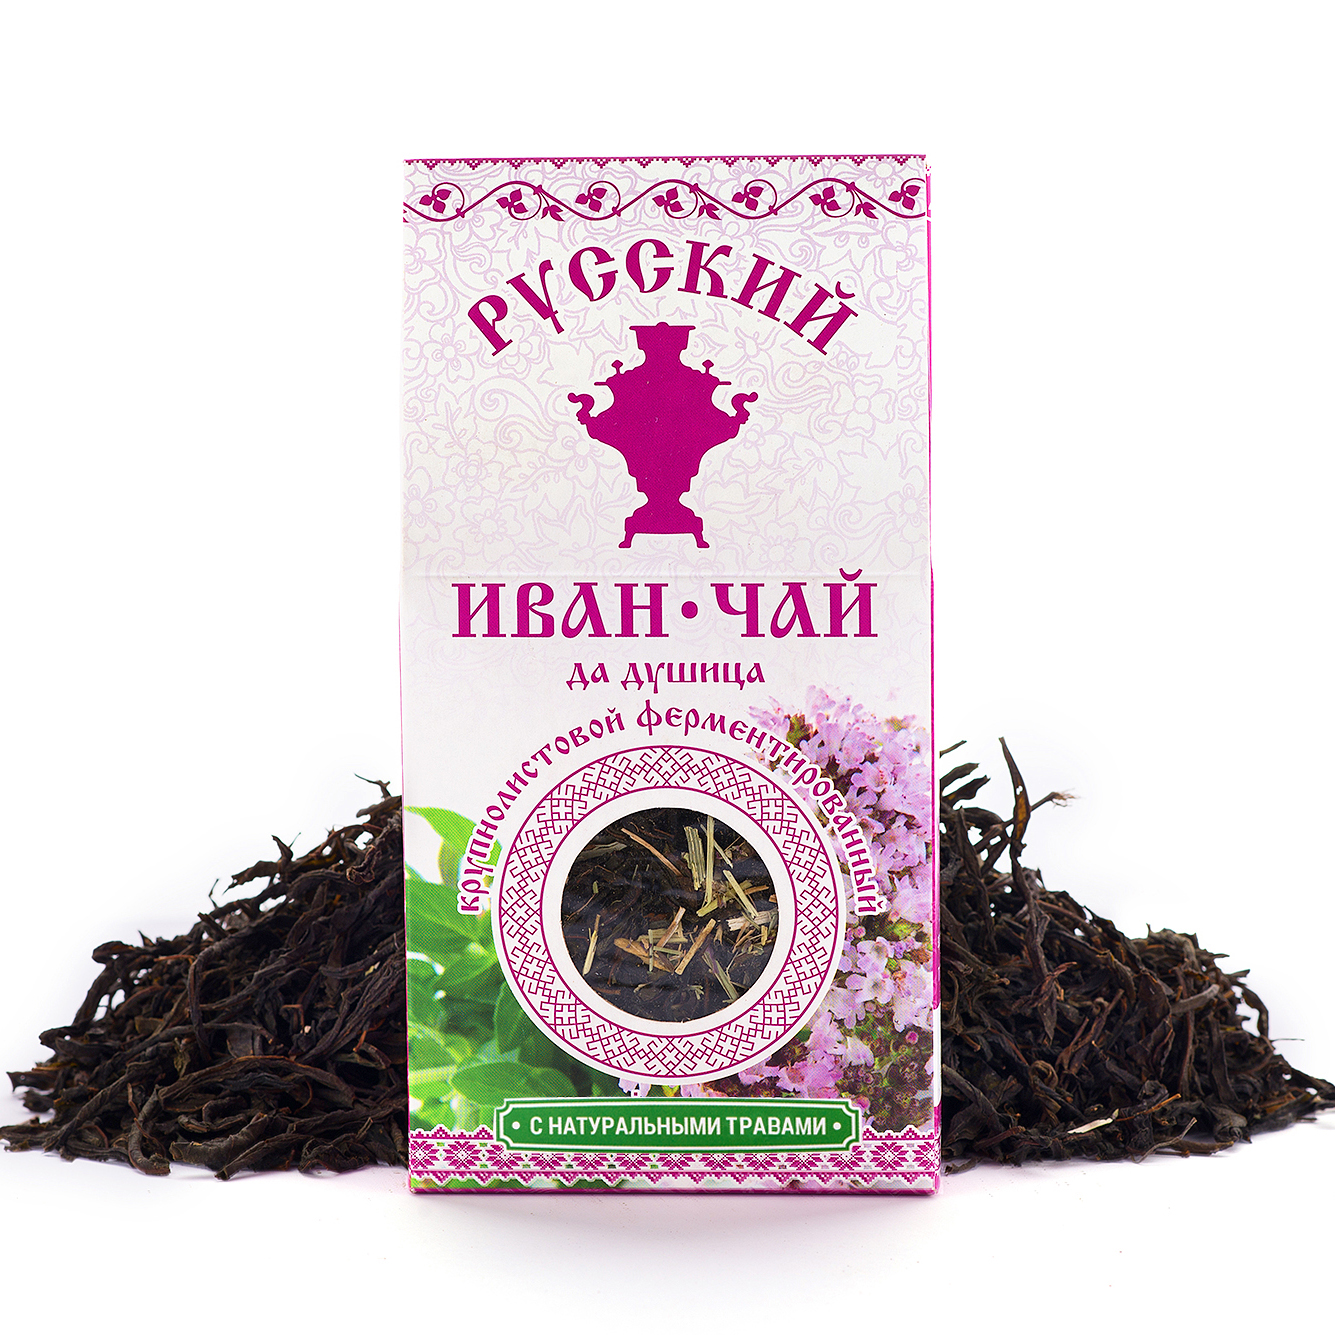 Ivan Tea with Oregano, 1.77 oz / 50 g